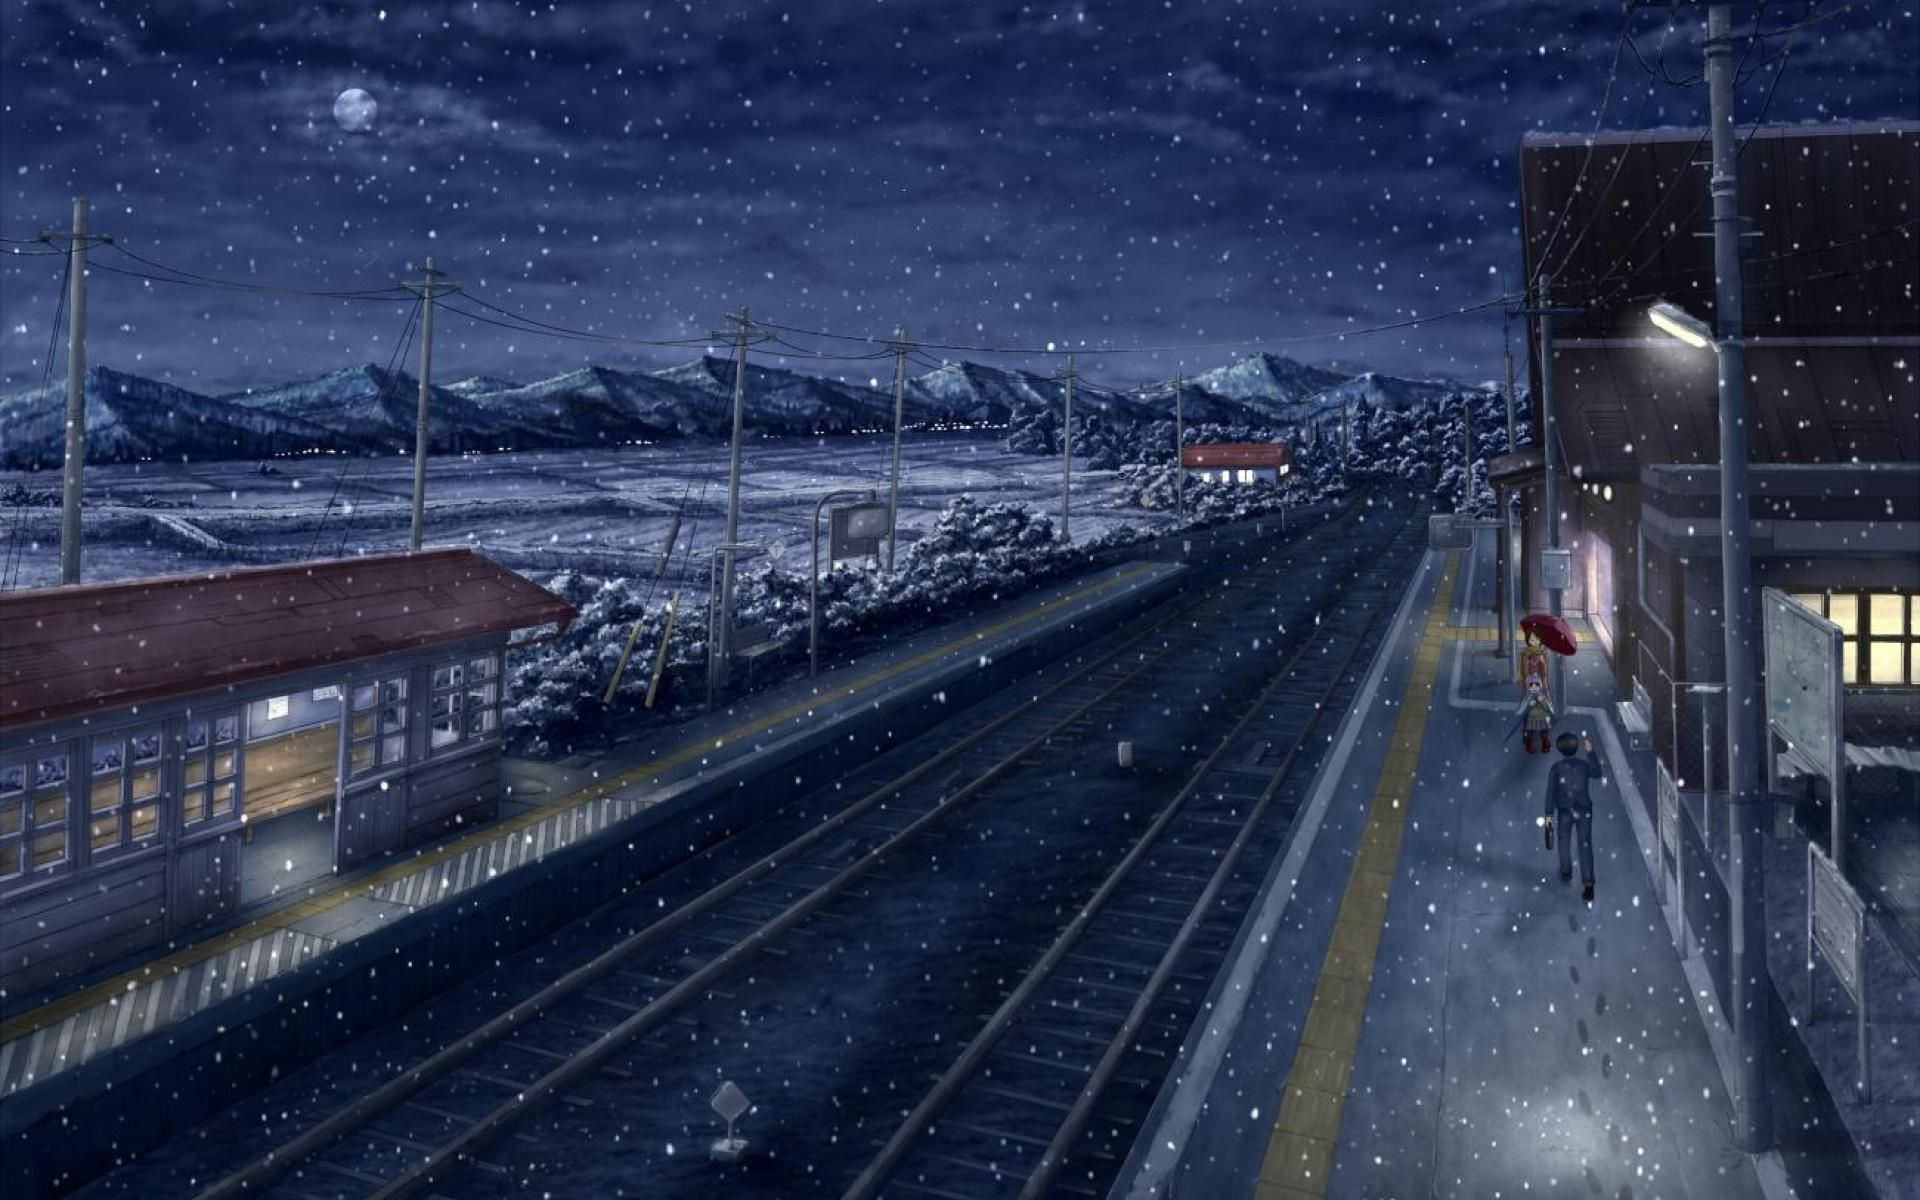 Winter Rail Girl Snow Umbrella Anime Scenery Winter Scenery Scenery Wallpaper